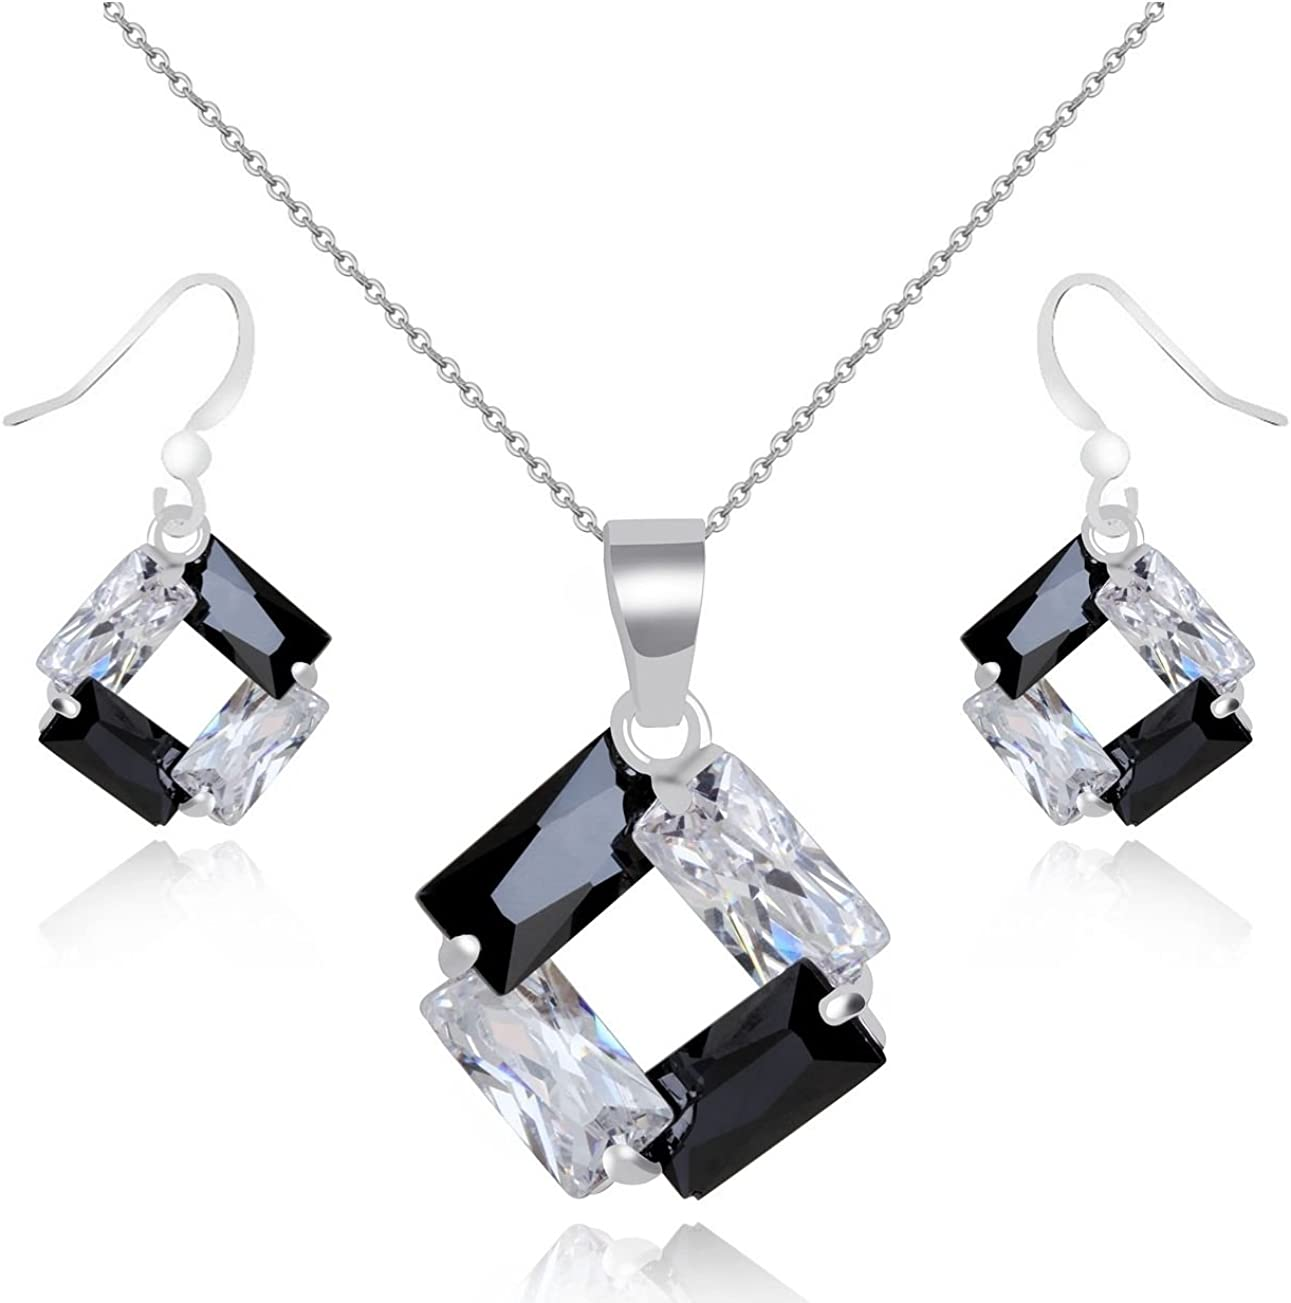 Crystalline Azuria Colorful Zirconia Crystals Rhombus Jewellery Set Pendant Necklace 18